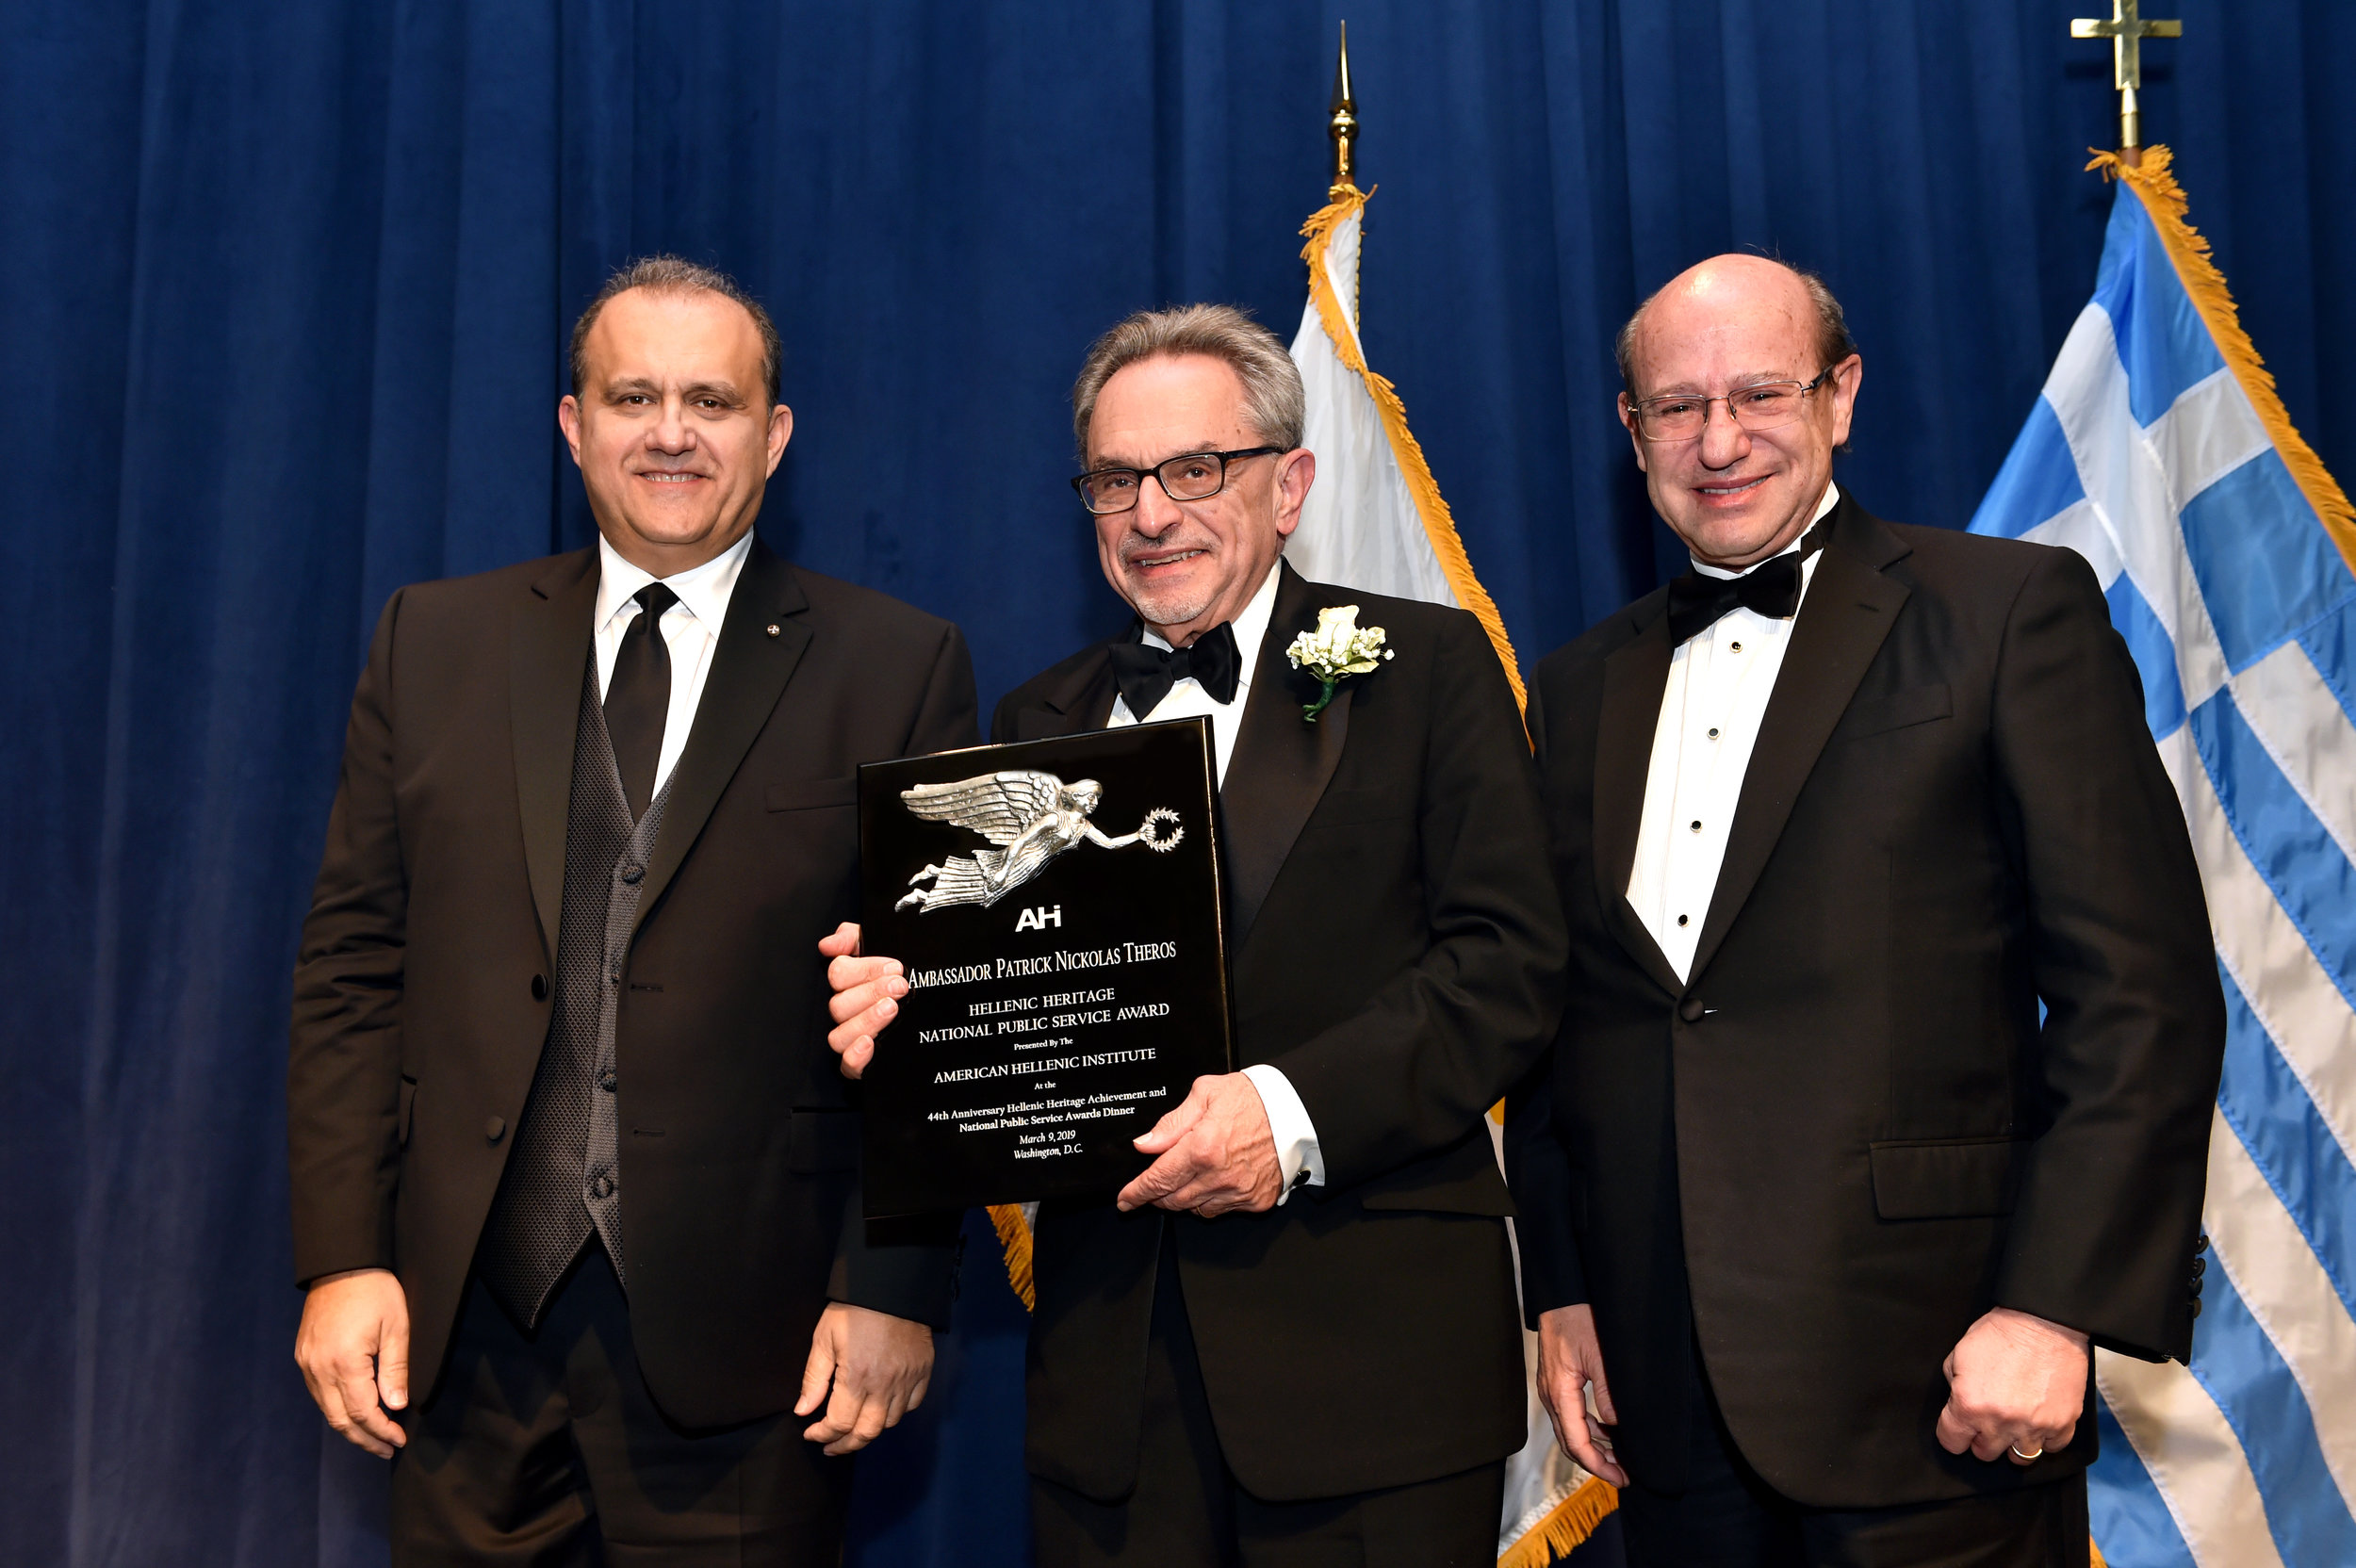 Ambassador Patrick Theros receiving the award from Nick Larigakis and Costas Galanis